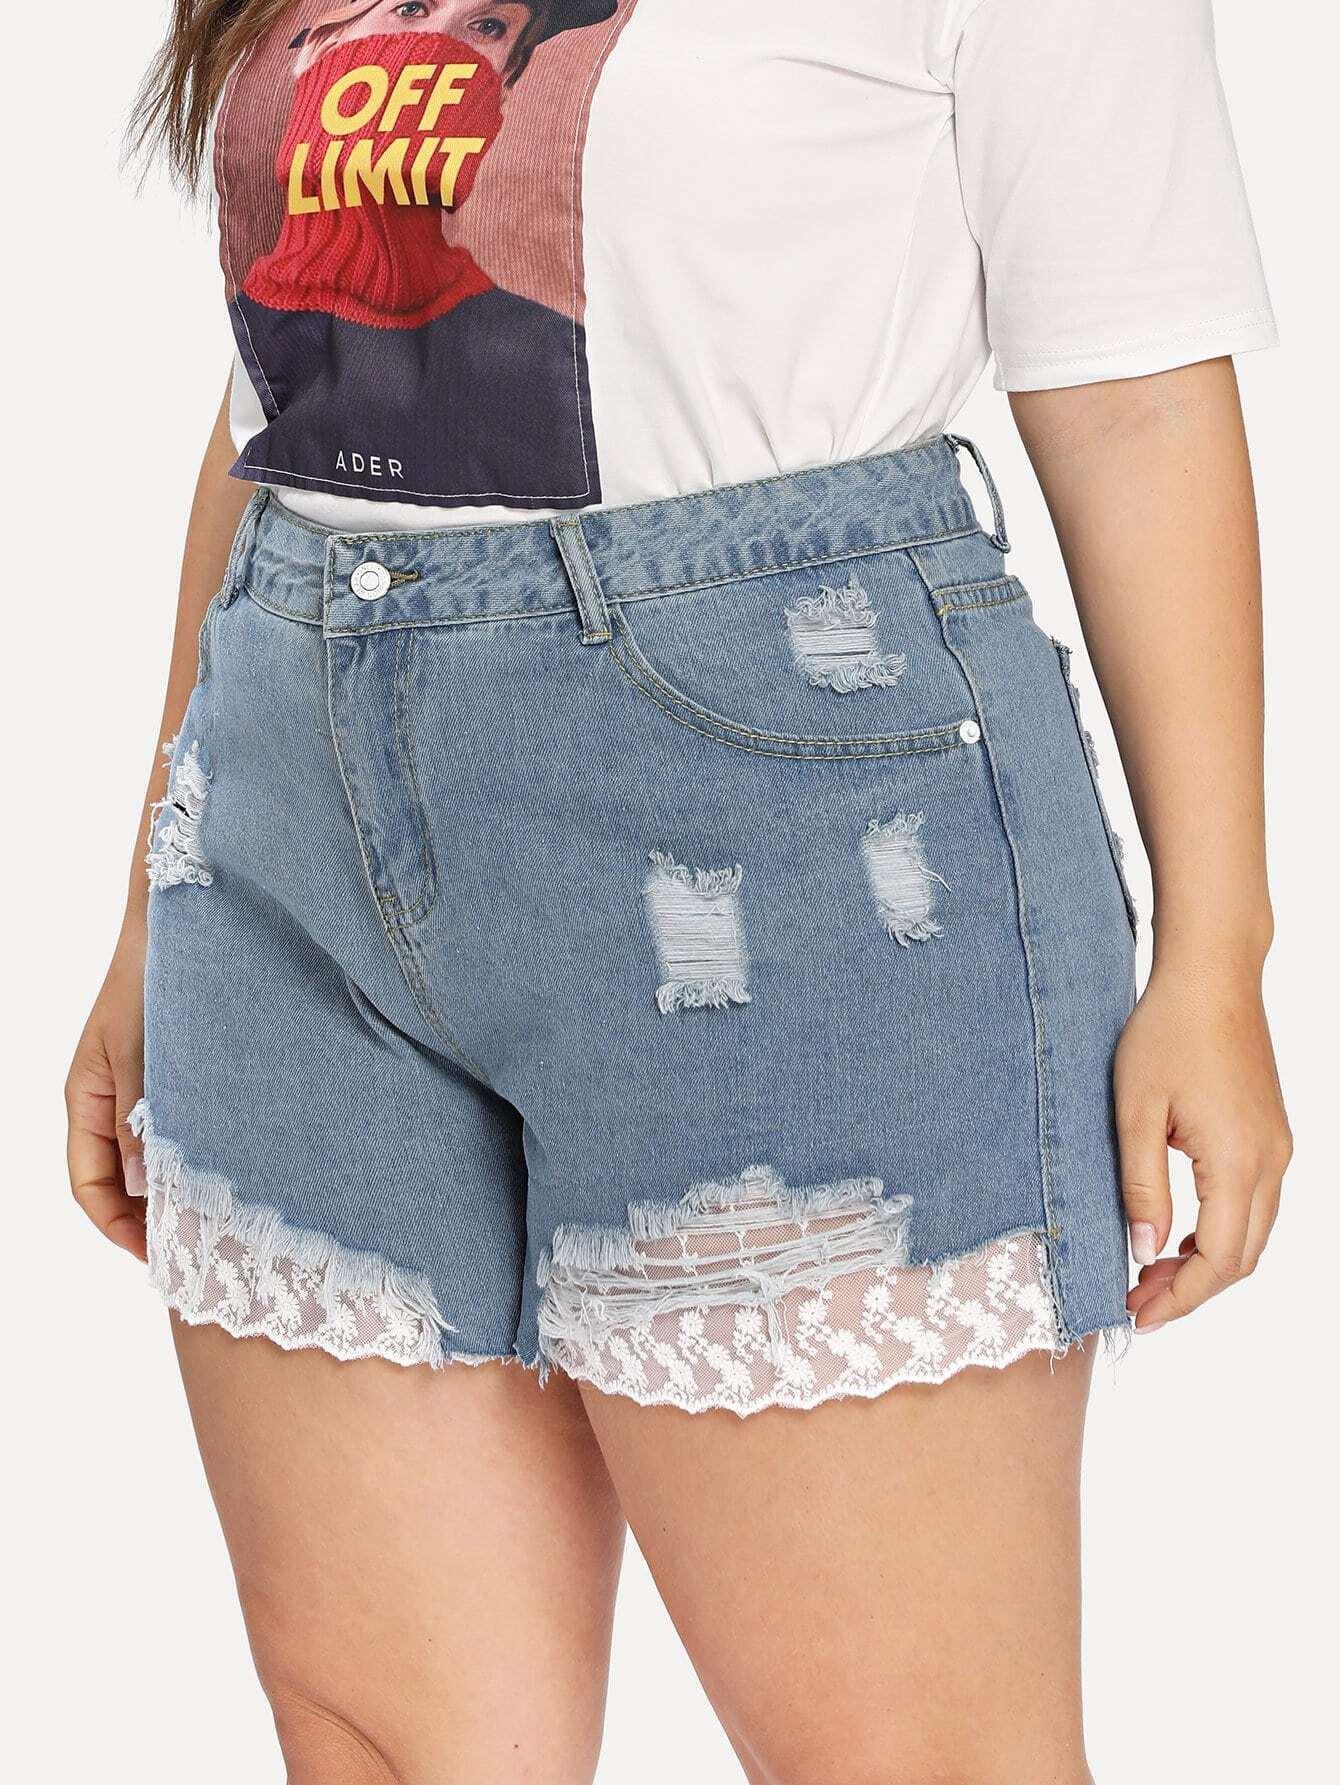 Embroidered Mesh Insert Distressed Denim Shorts distressed lace insert denim jeans